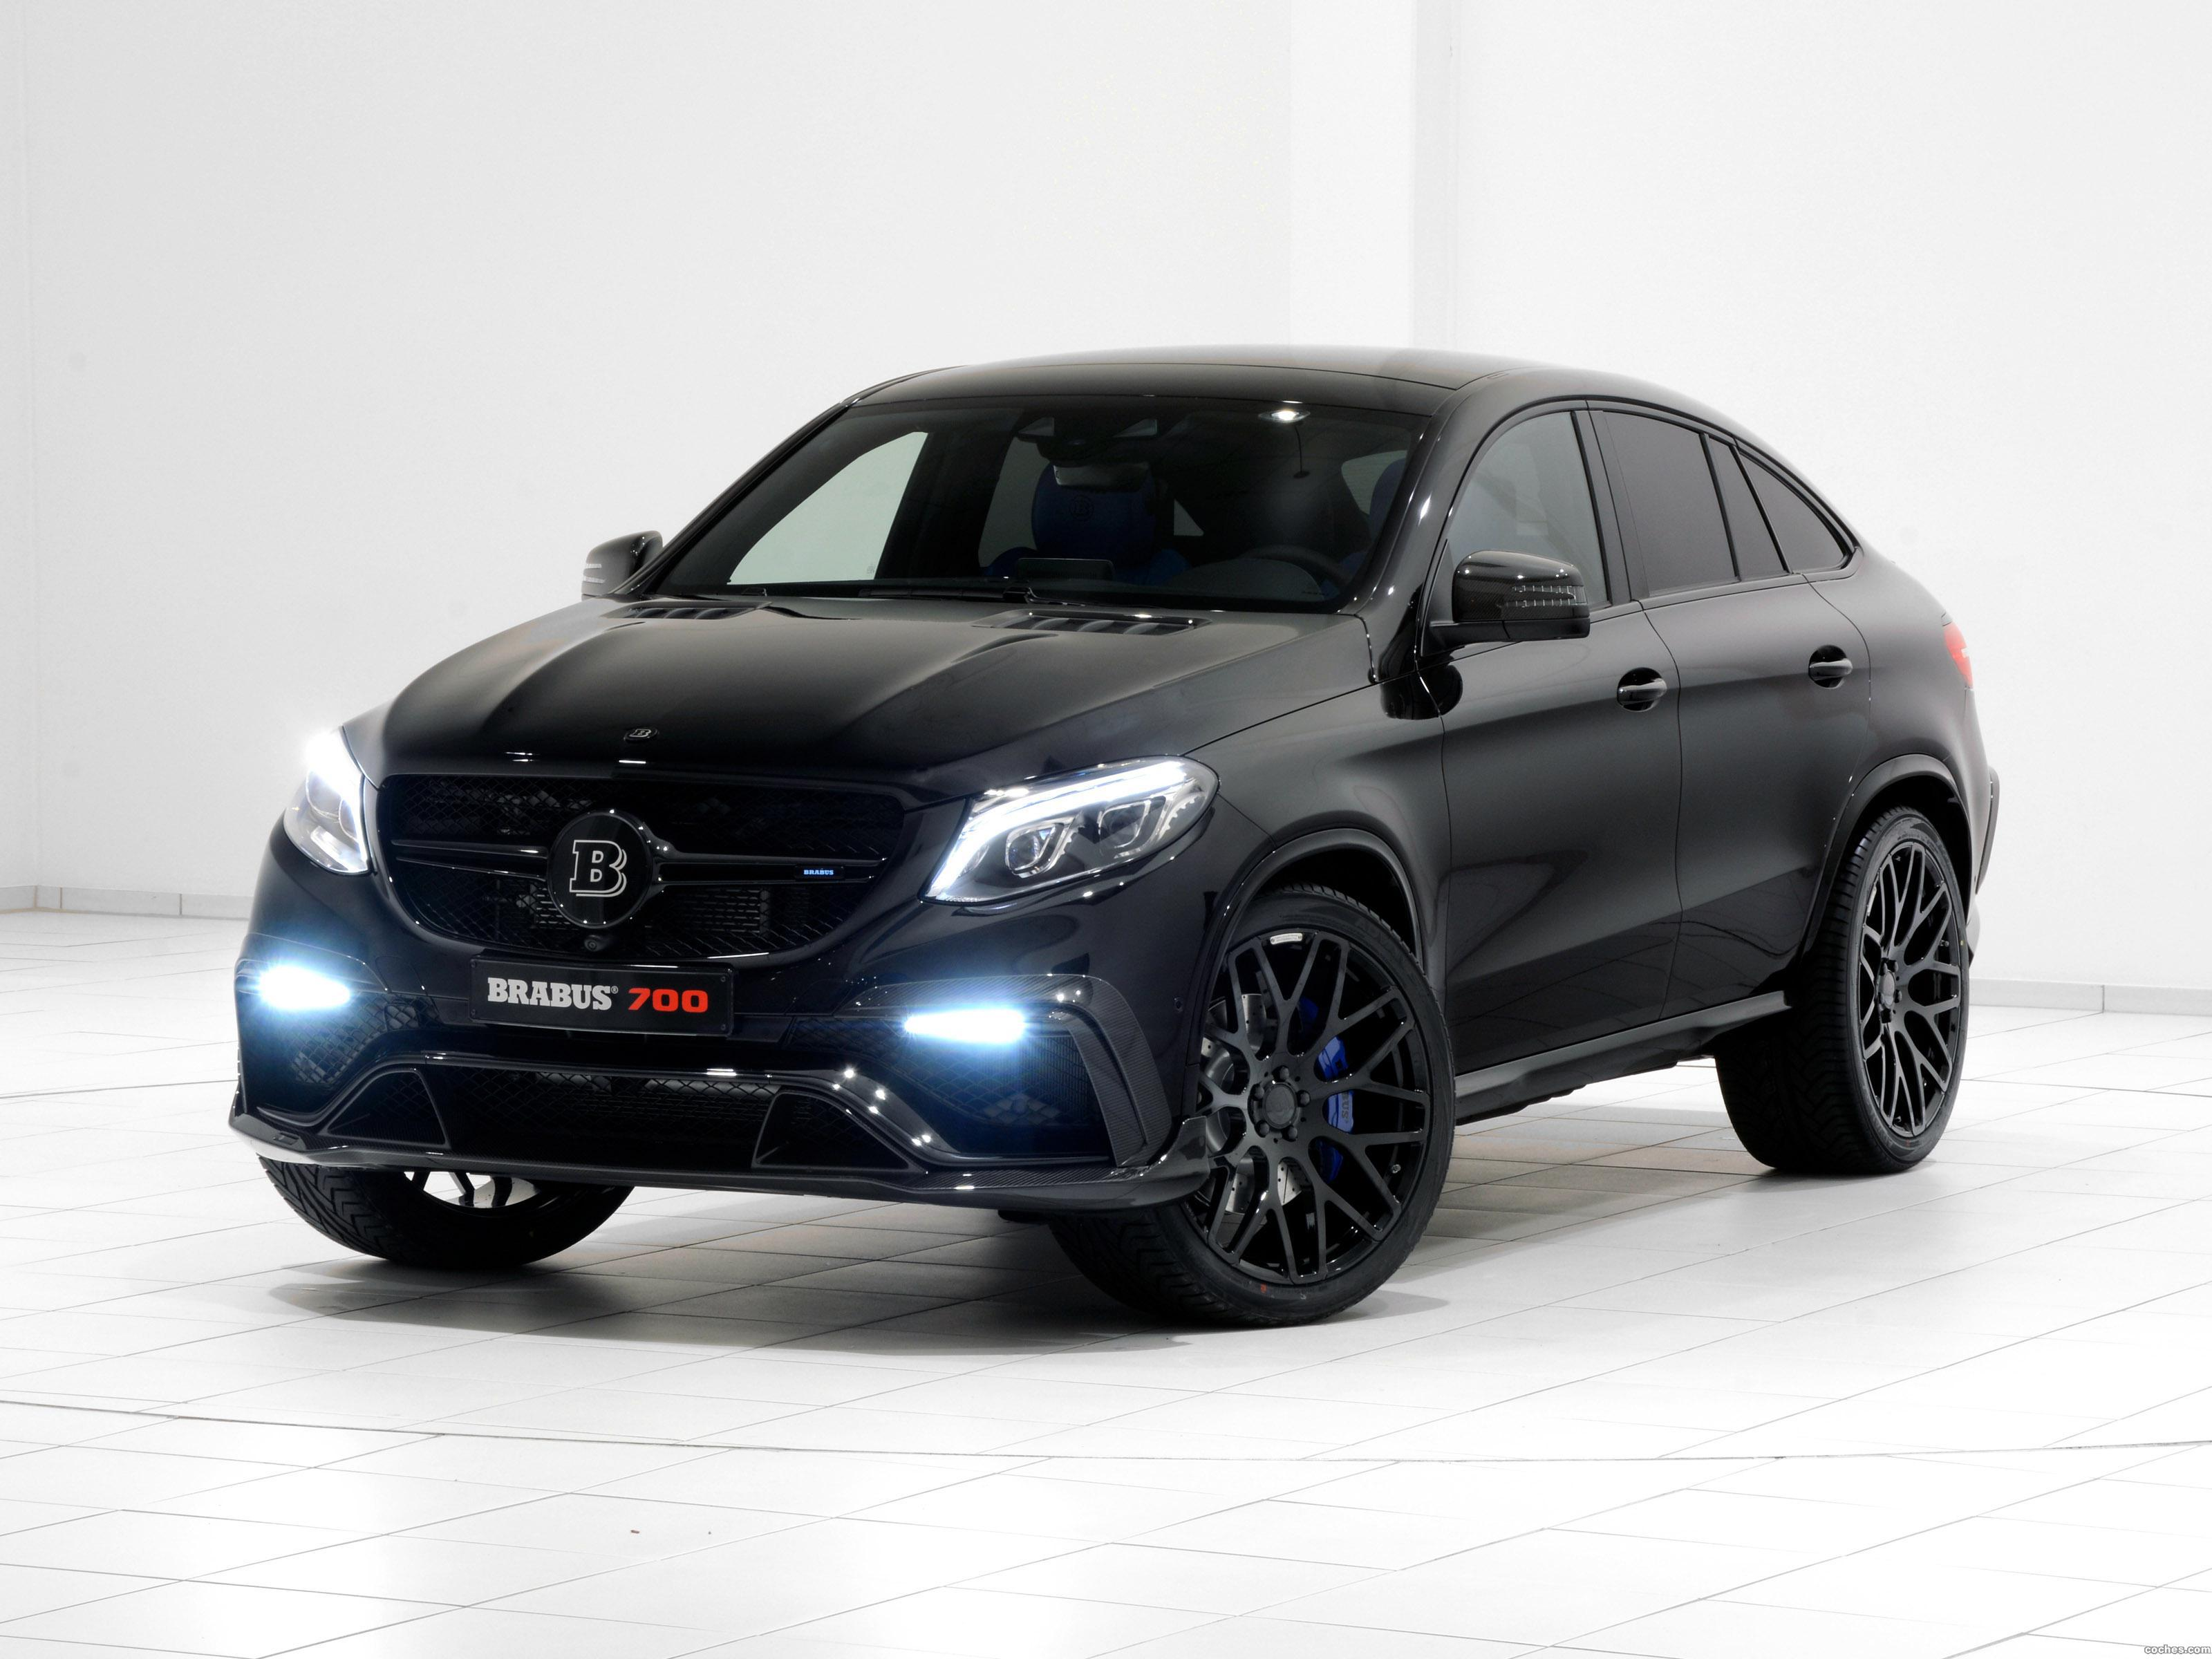 Foto 0 de Mercedes Brabus AMG GLE 63 4MATIC Coupe C292 2015